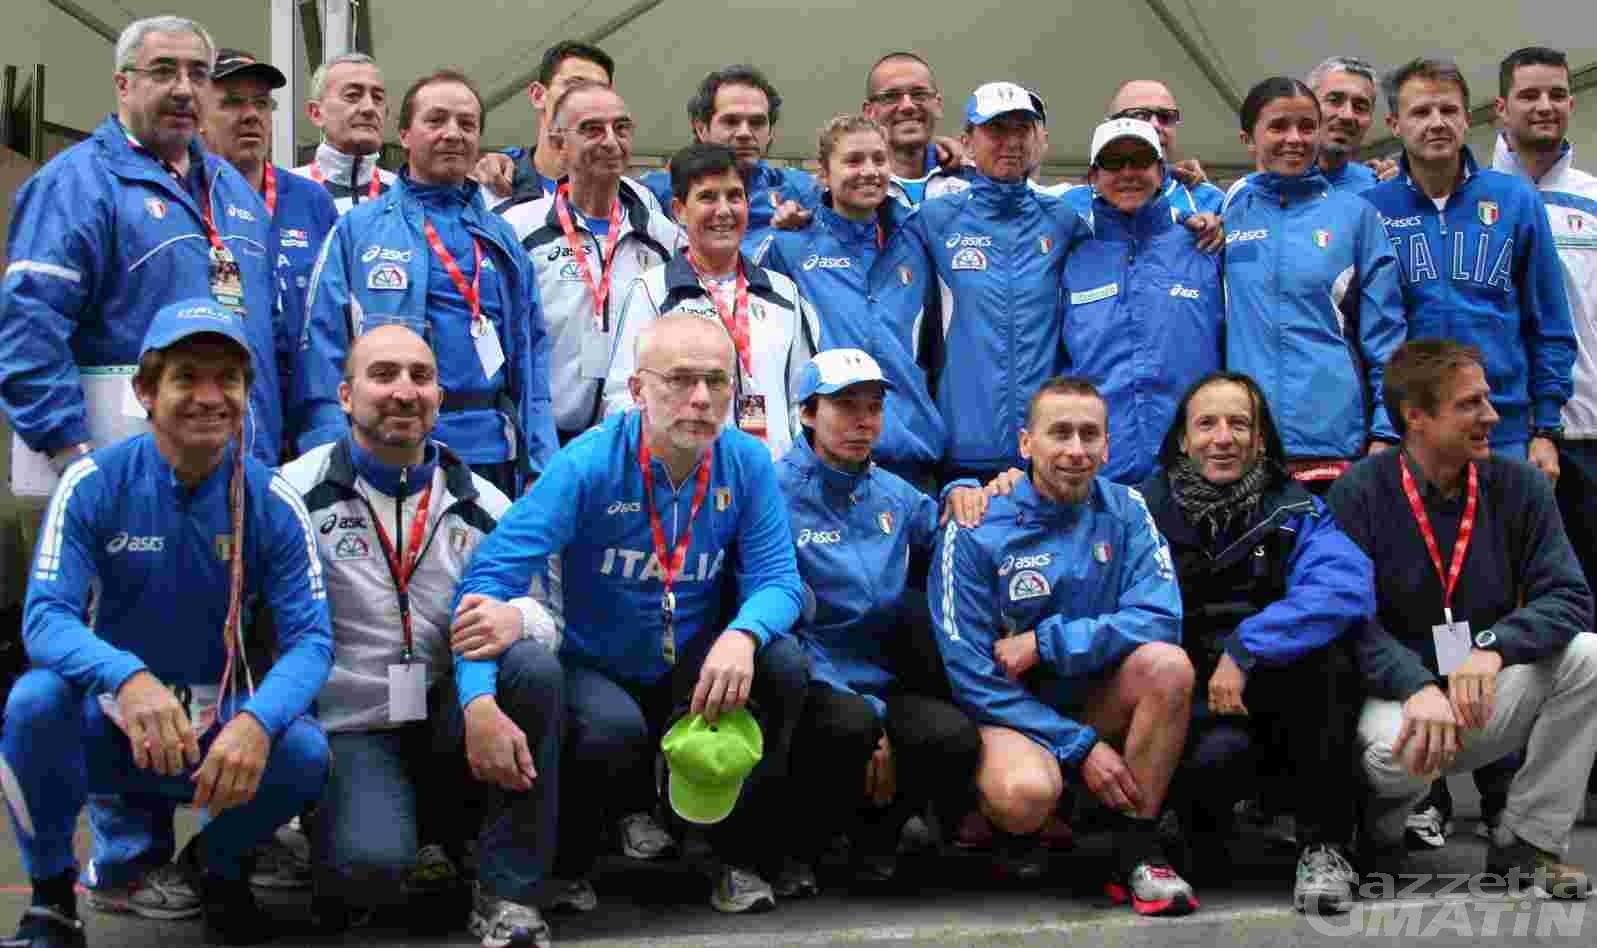 Ultramaratona: gli azzurri in ritiro in Valle d'Aosta